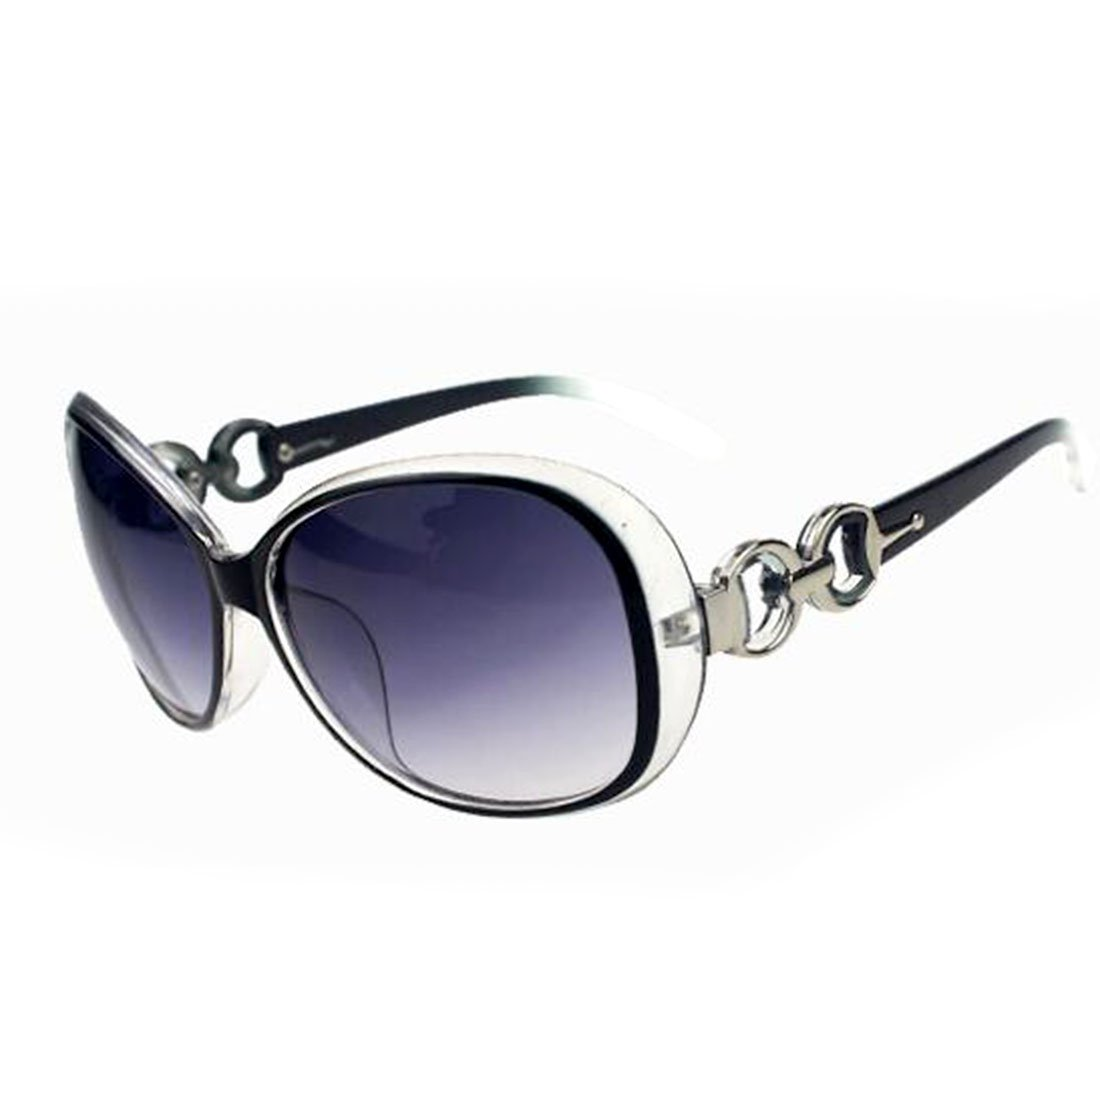 Women Shades Oversized Eyewear Classic Designer Sunglasses UV400-Black&Grey